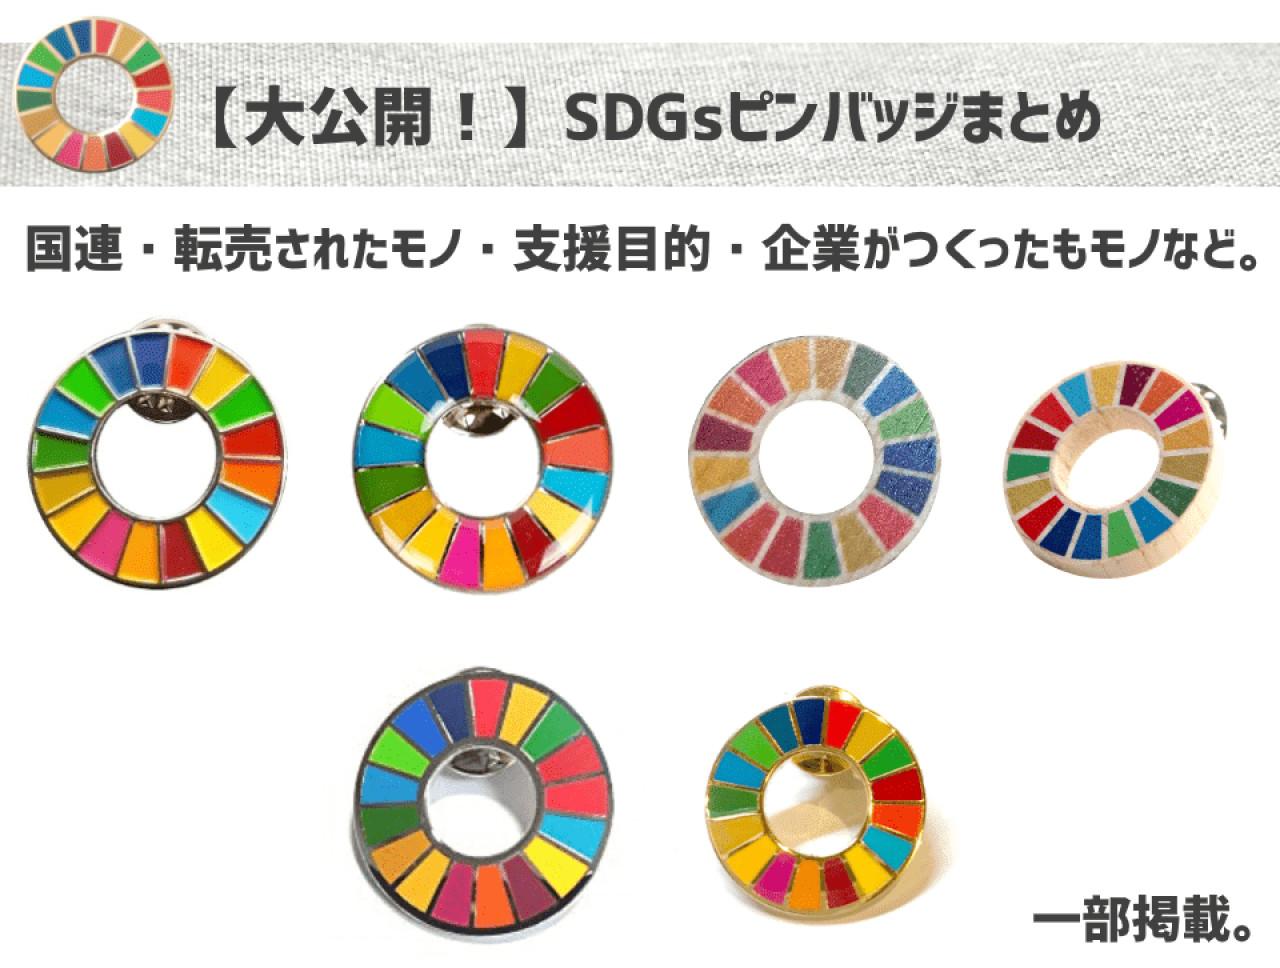 SDGsピンバッジの種類